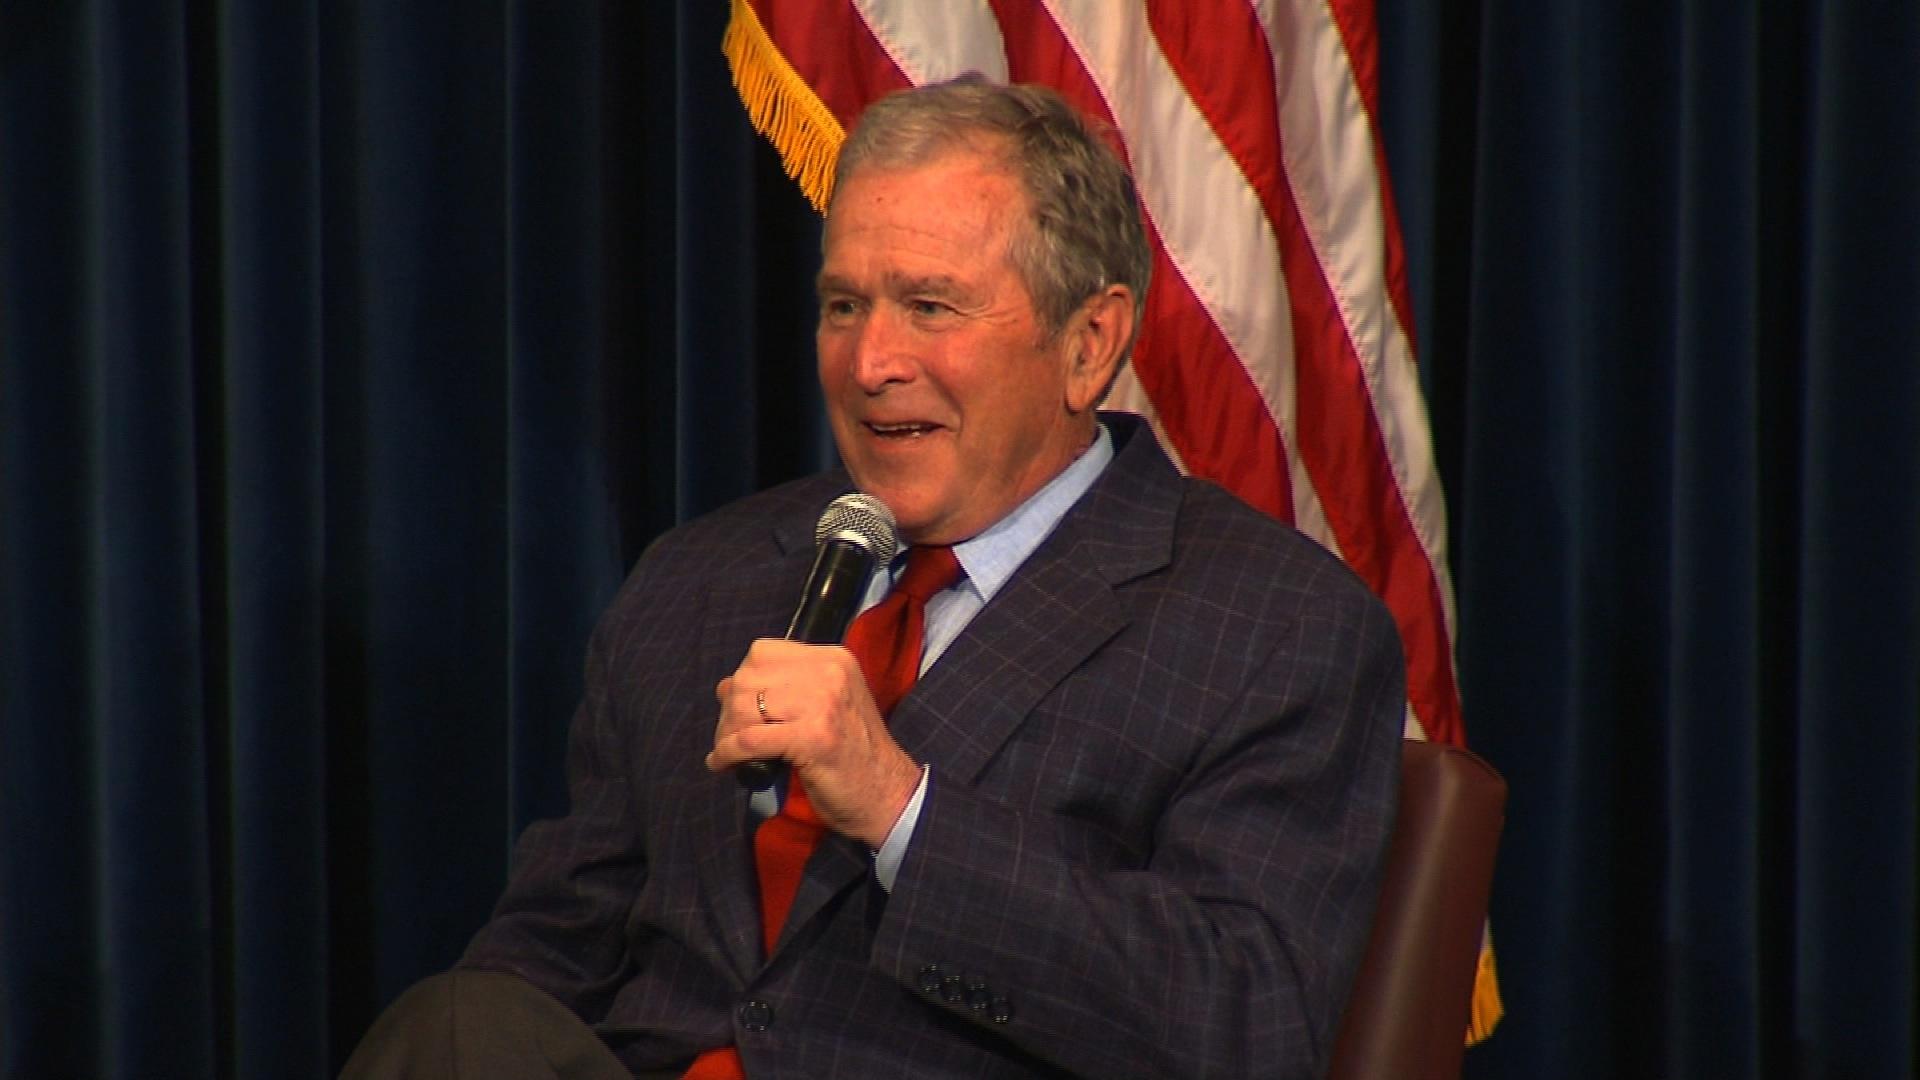 Stunning George W Bush Resume Images Simple Resume Office